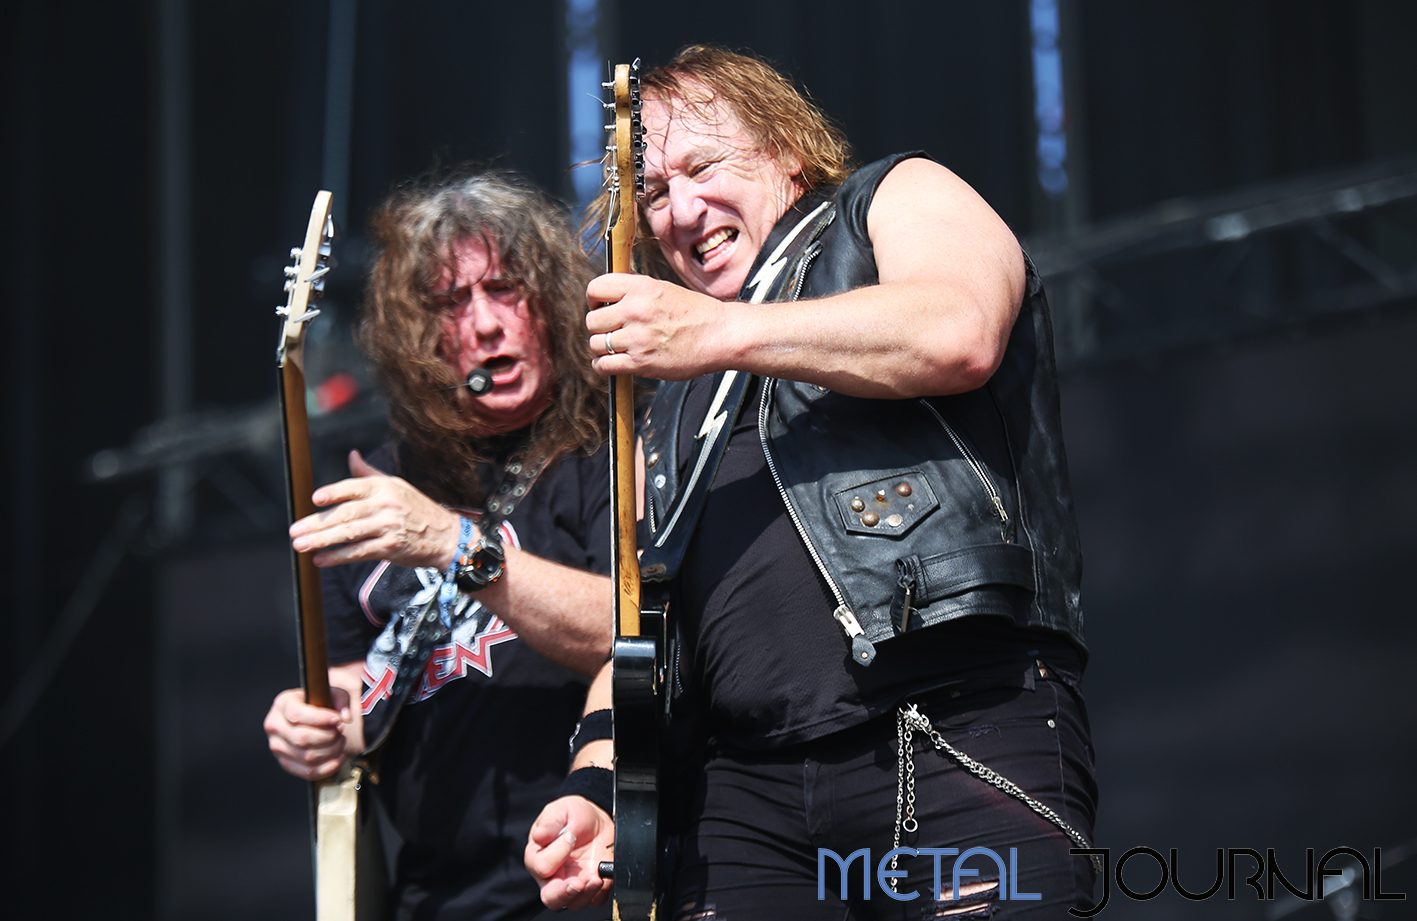 raven - metal journal rock fest barcelona 2019 pic 8